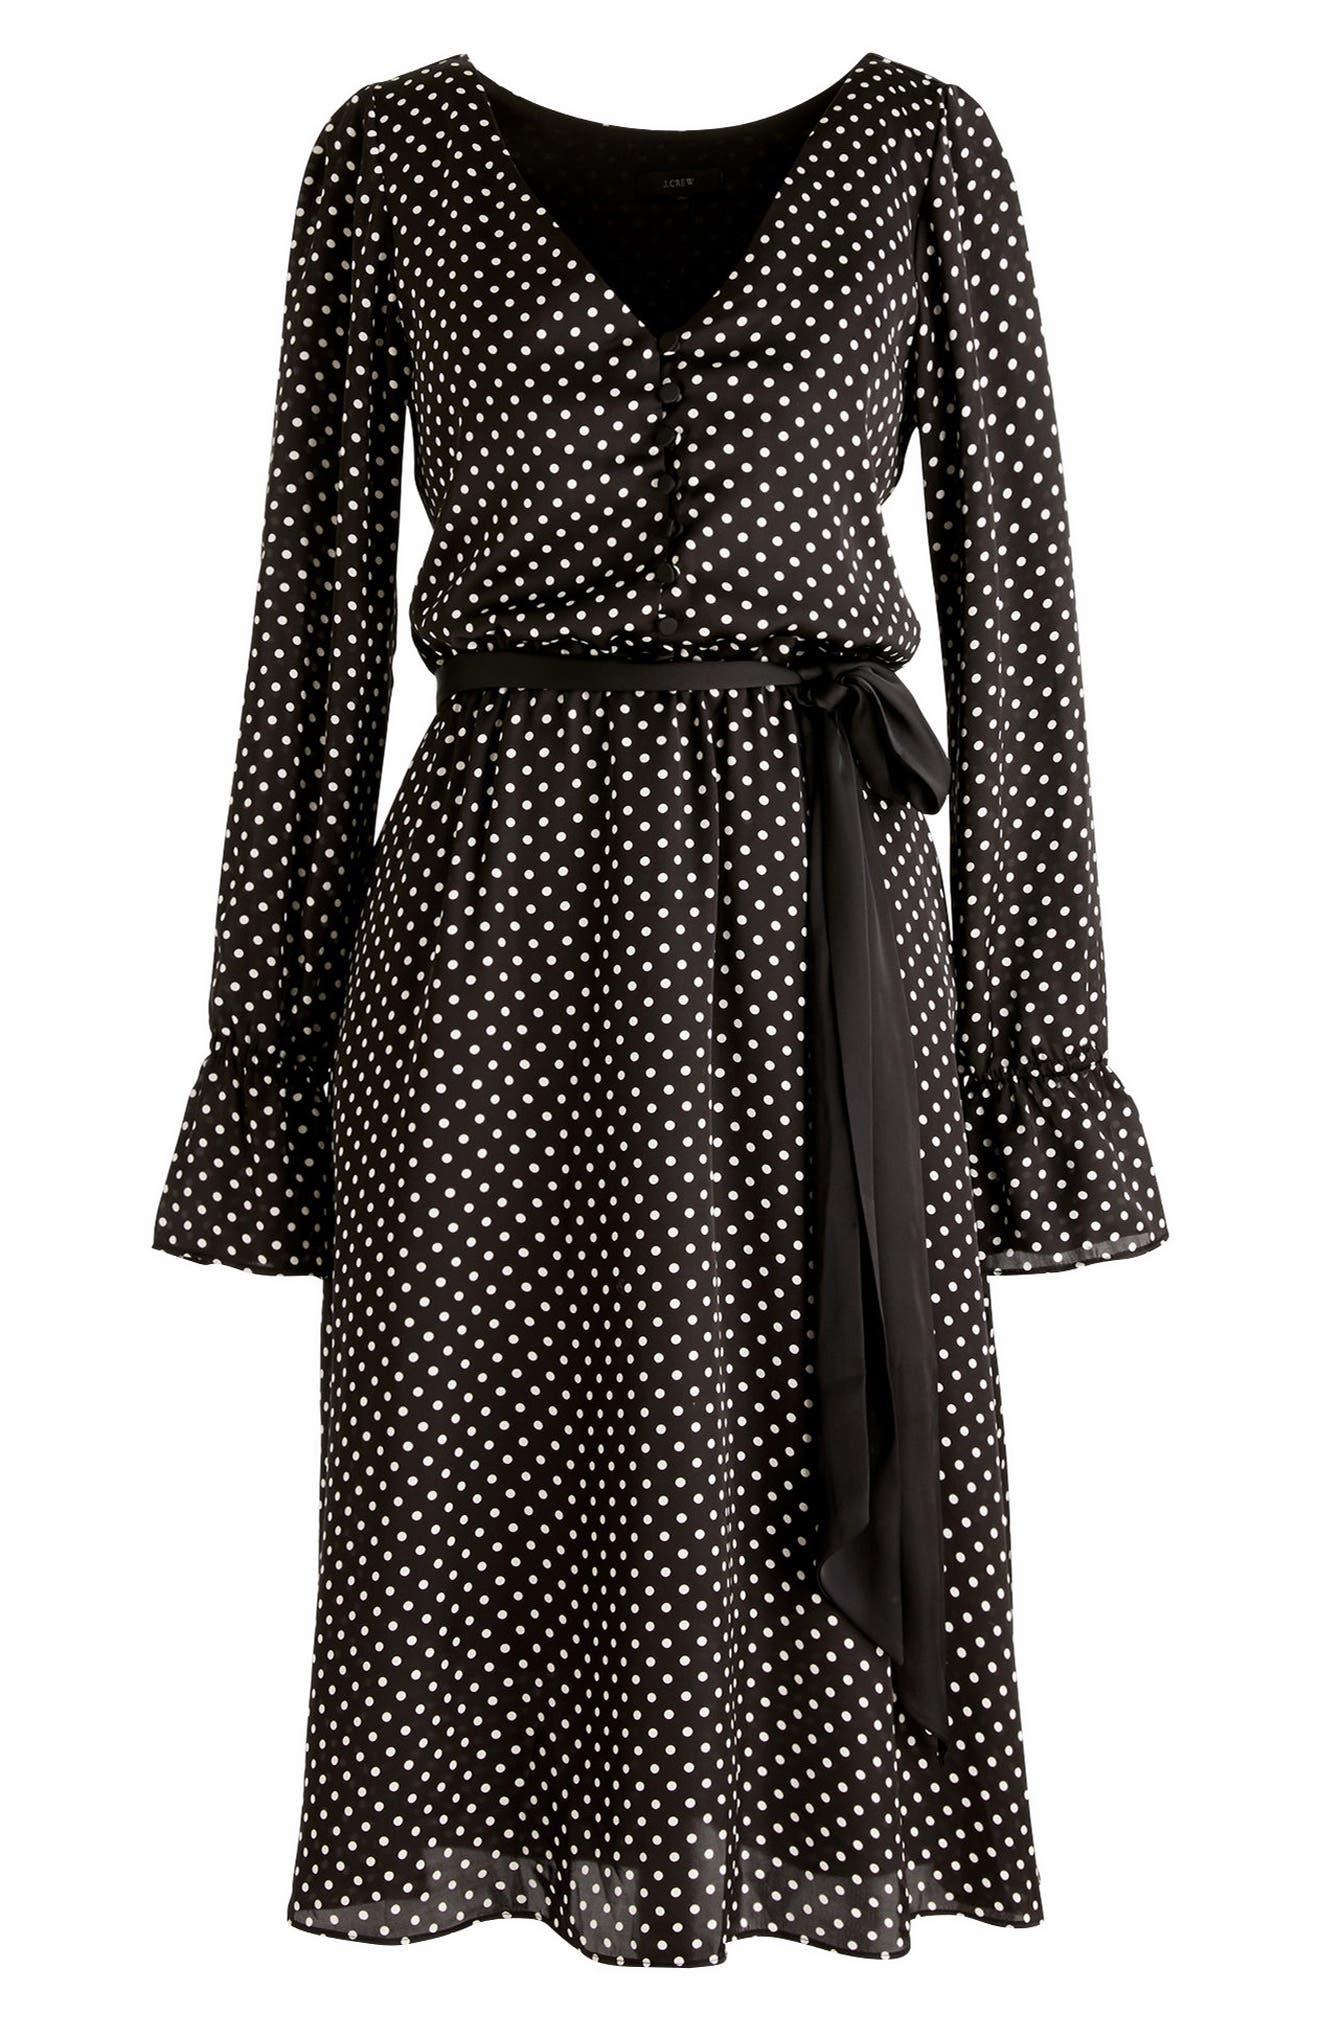 Long Sleeve Polka Dot Dress,                             Alternate thumbnail 3, color,                             009